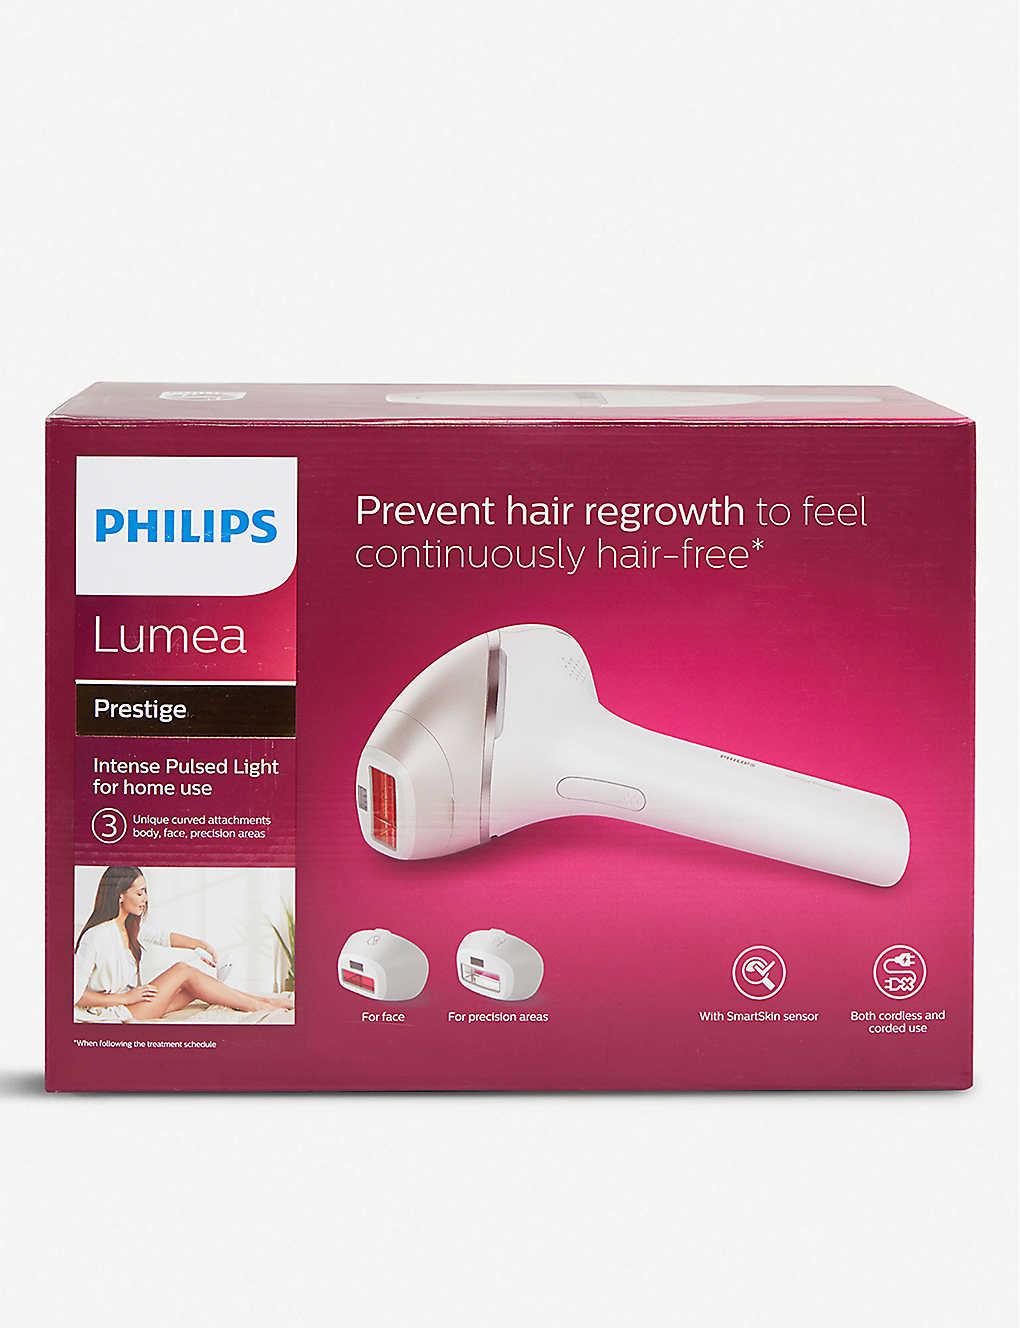 Lumea Prestige IPL Hair Removal